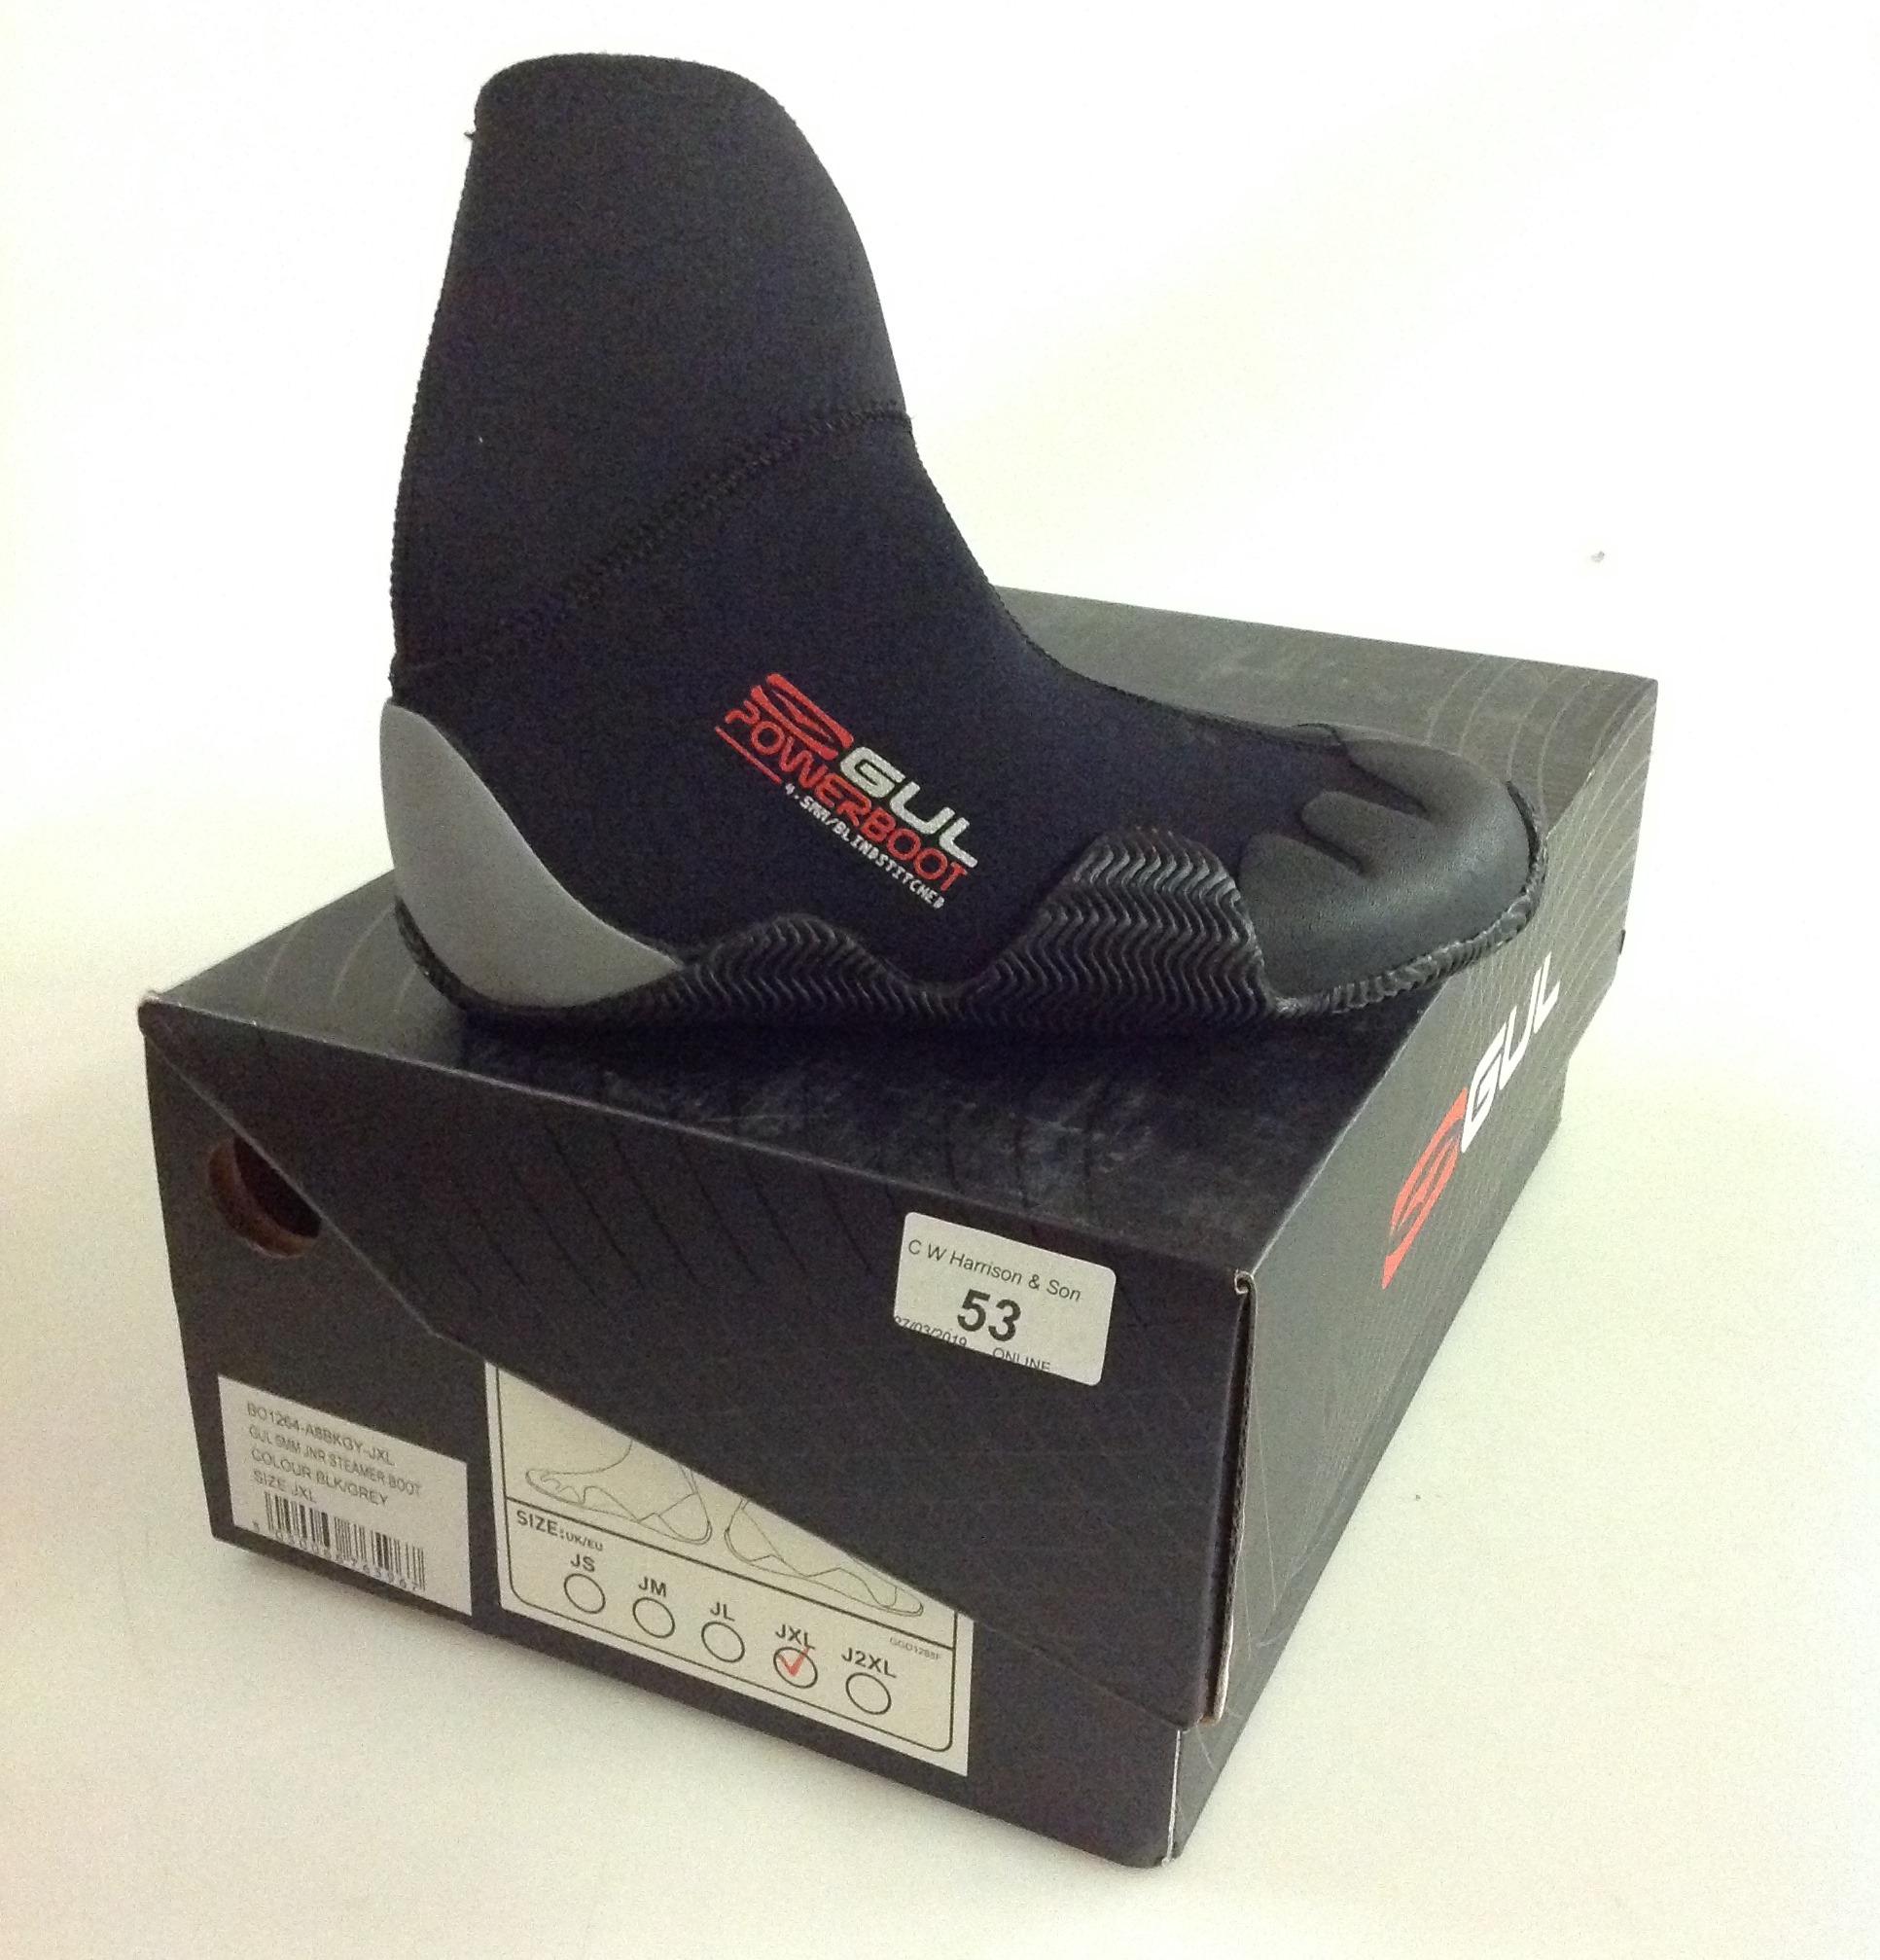 Lot 53 - Gul 5MM Jnr Steamer boot black and grey- size JXL